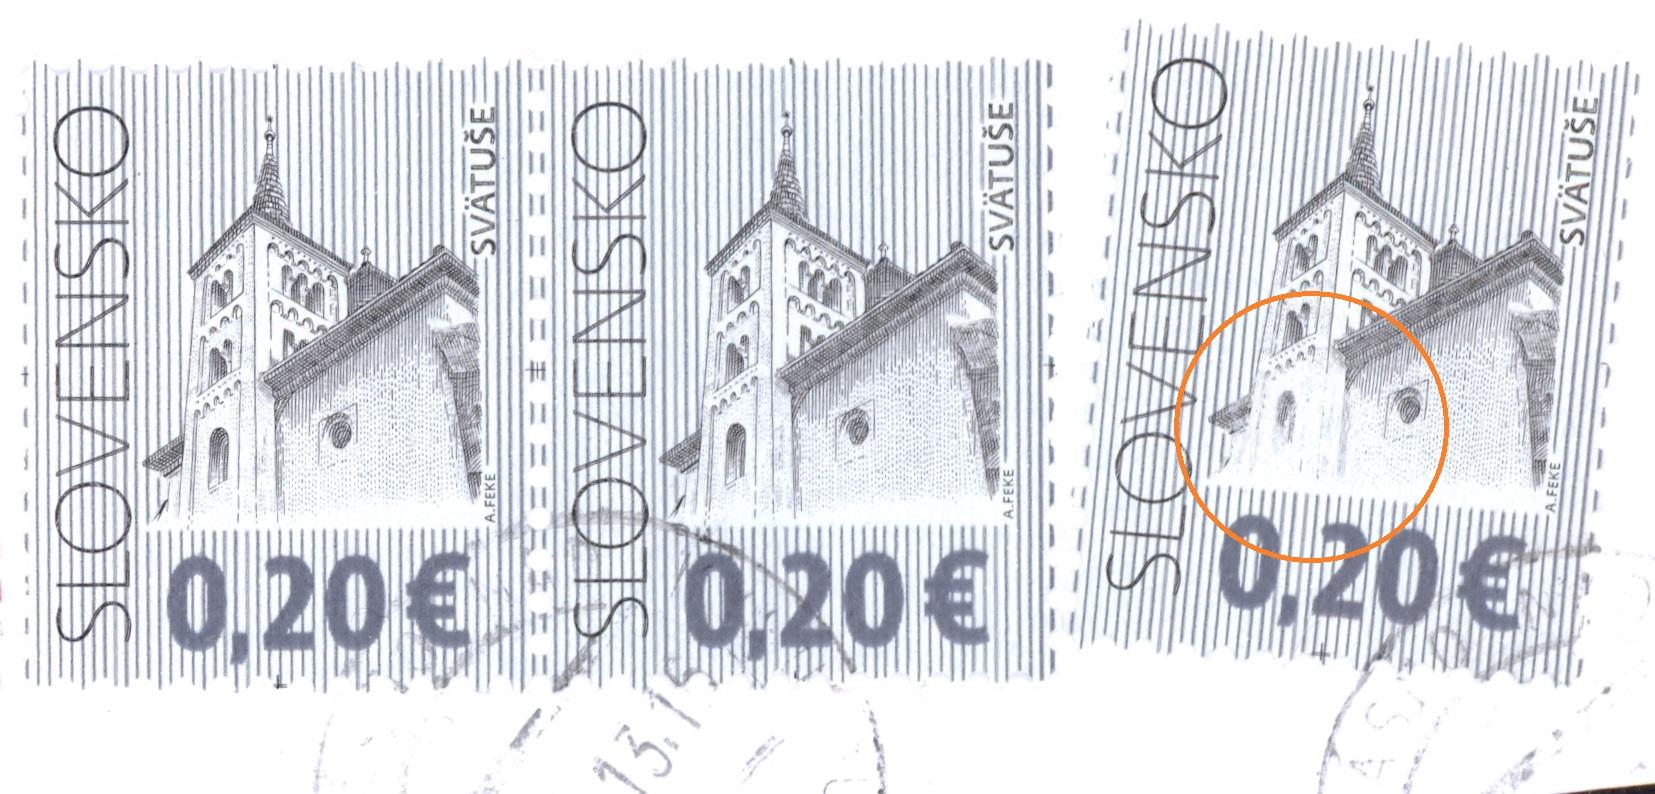 Poštové známky Kultúrne dedičstvo Slovenska